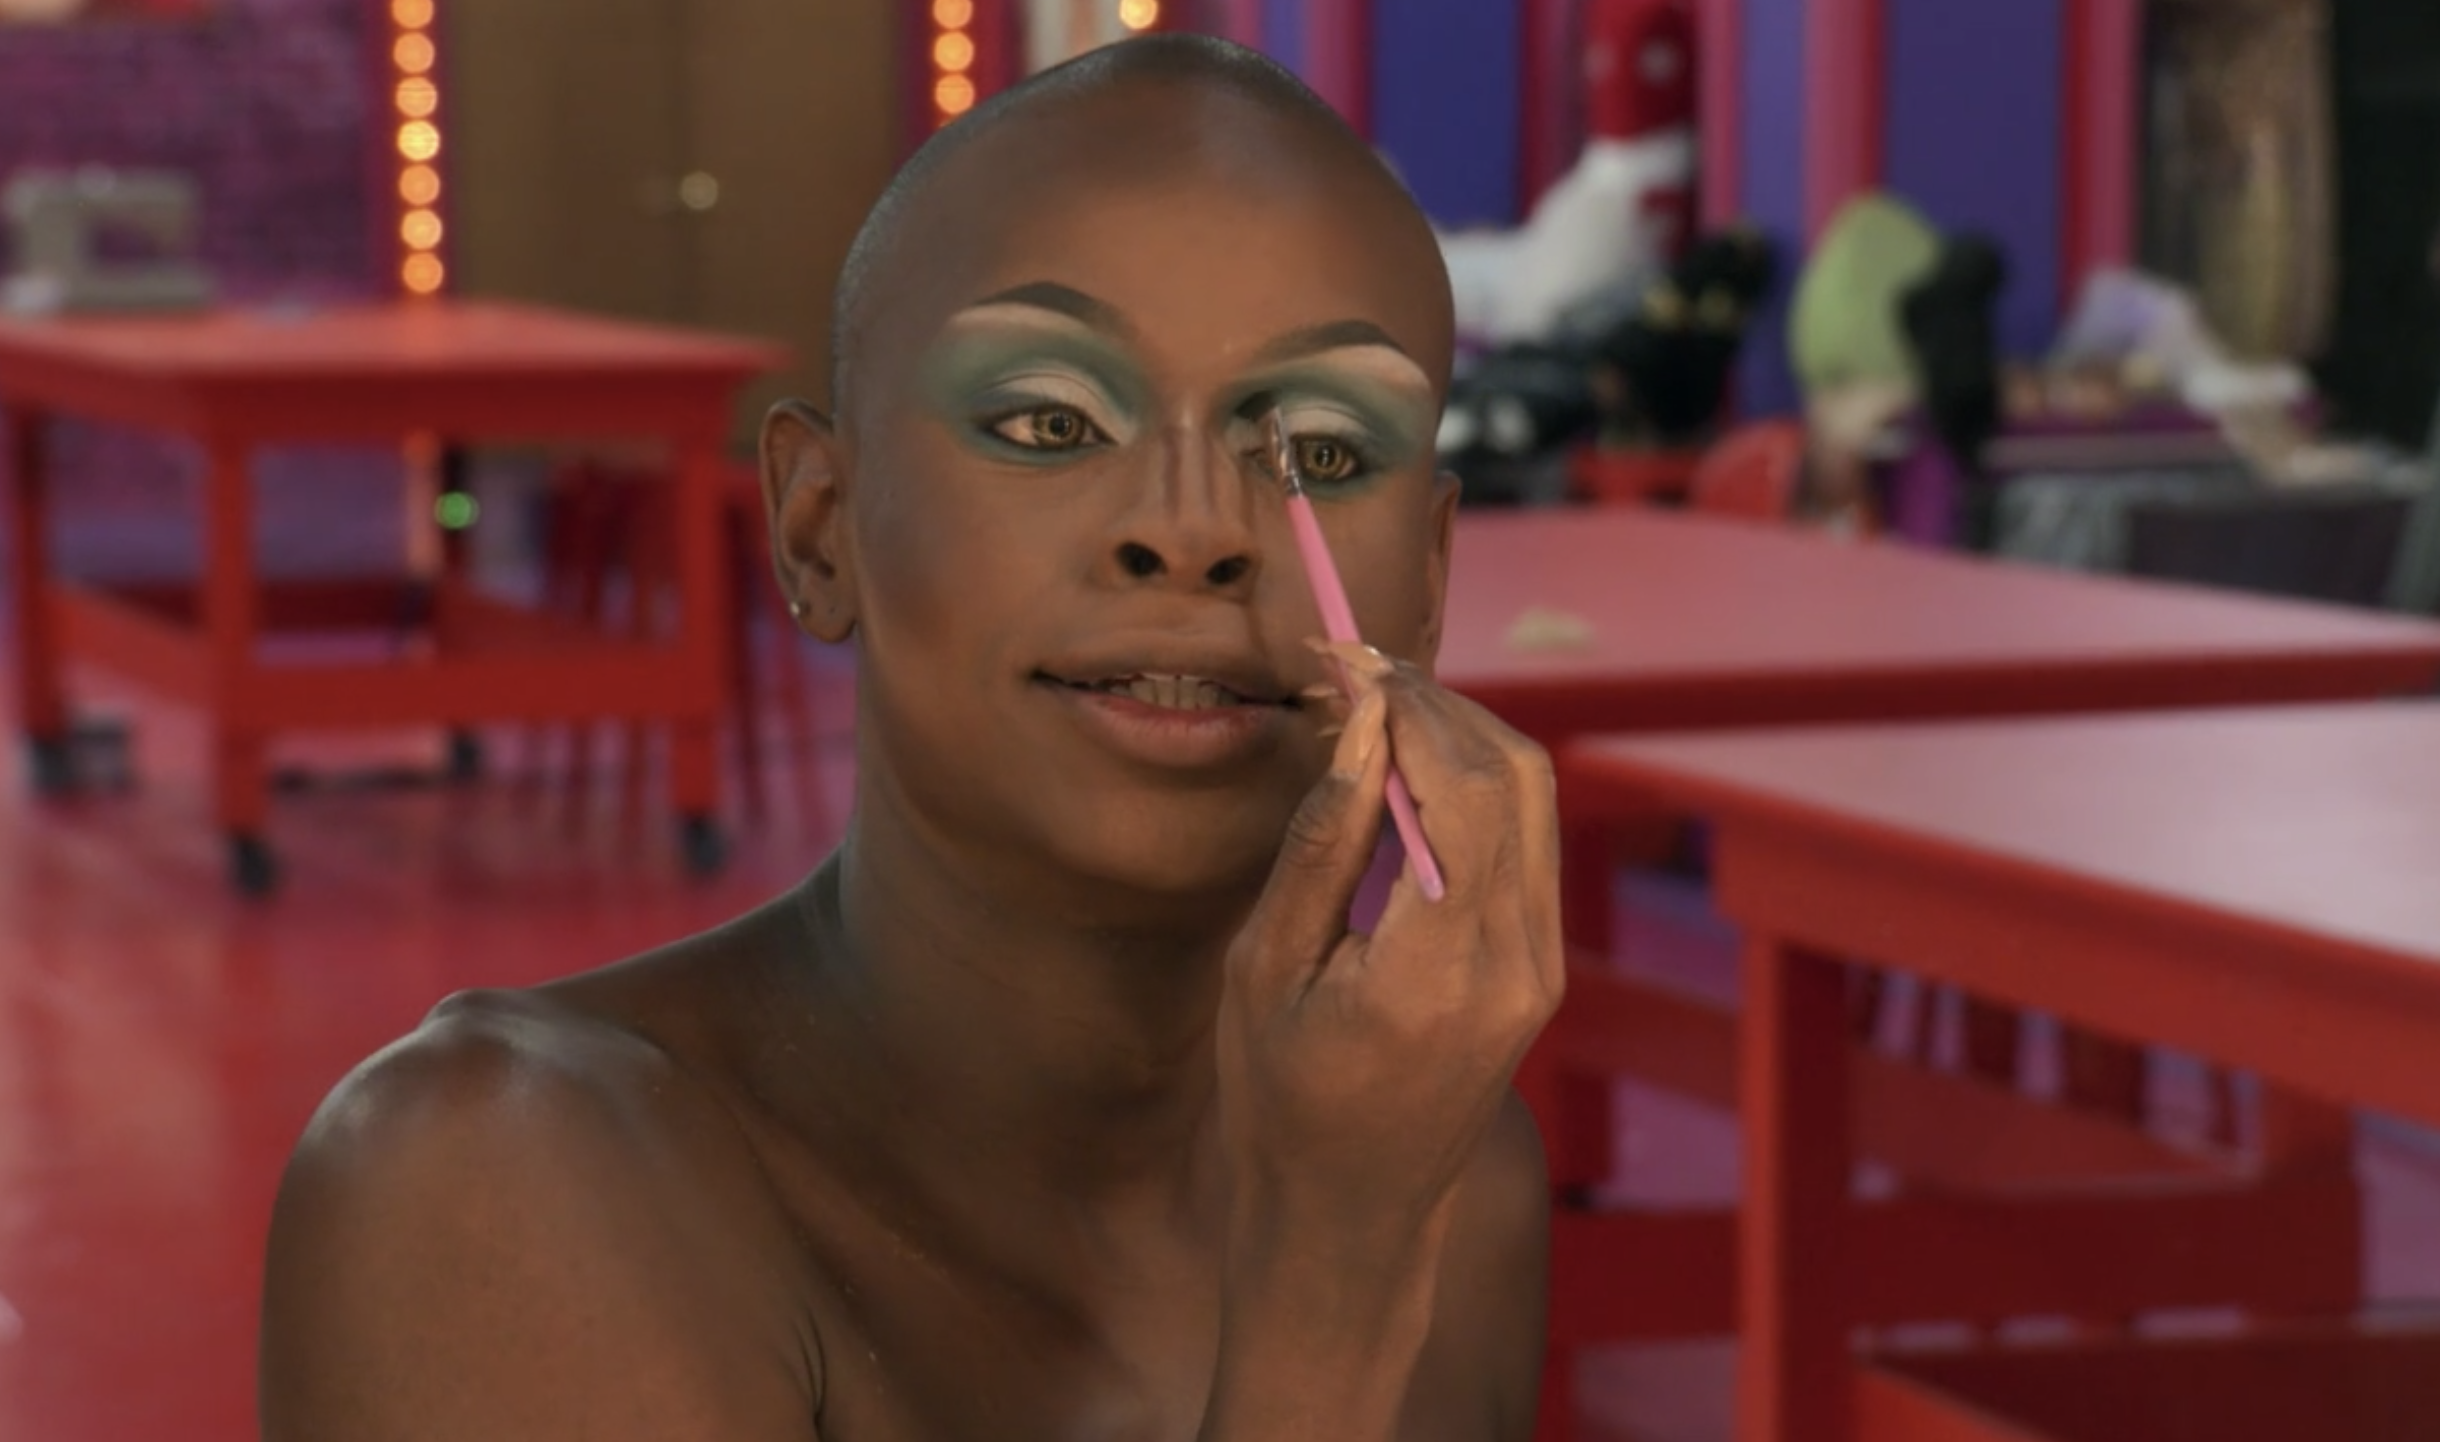 Symone doing her makeup